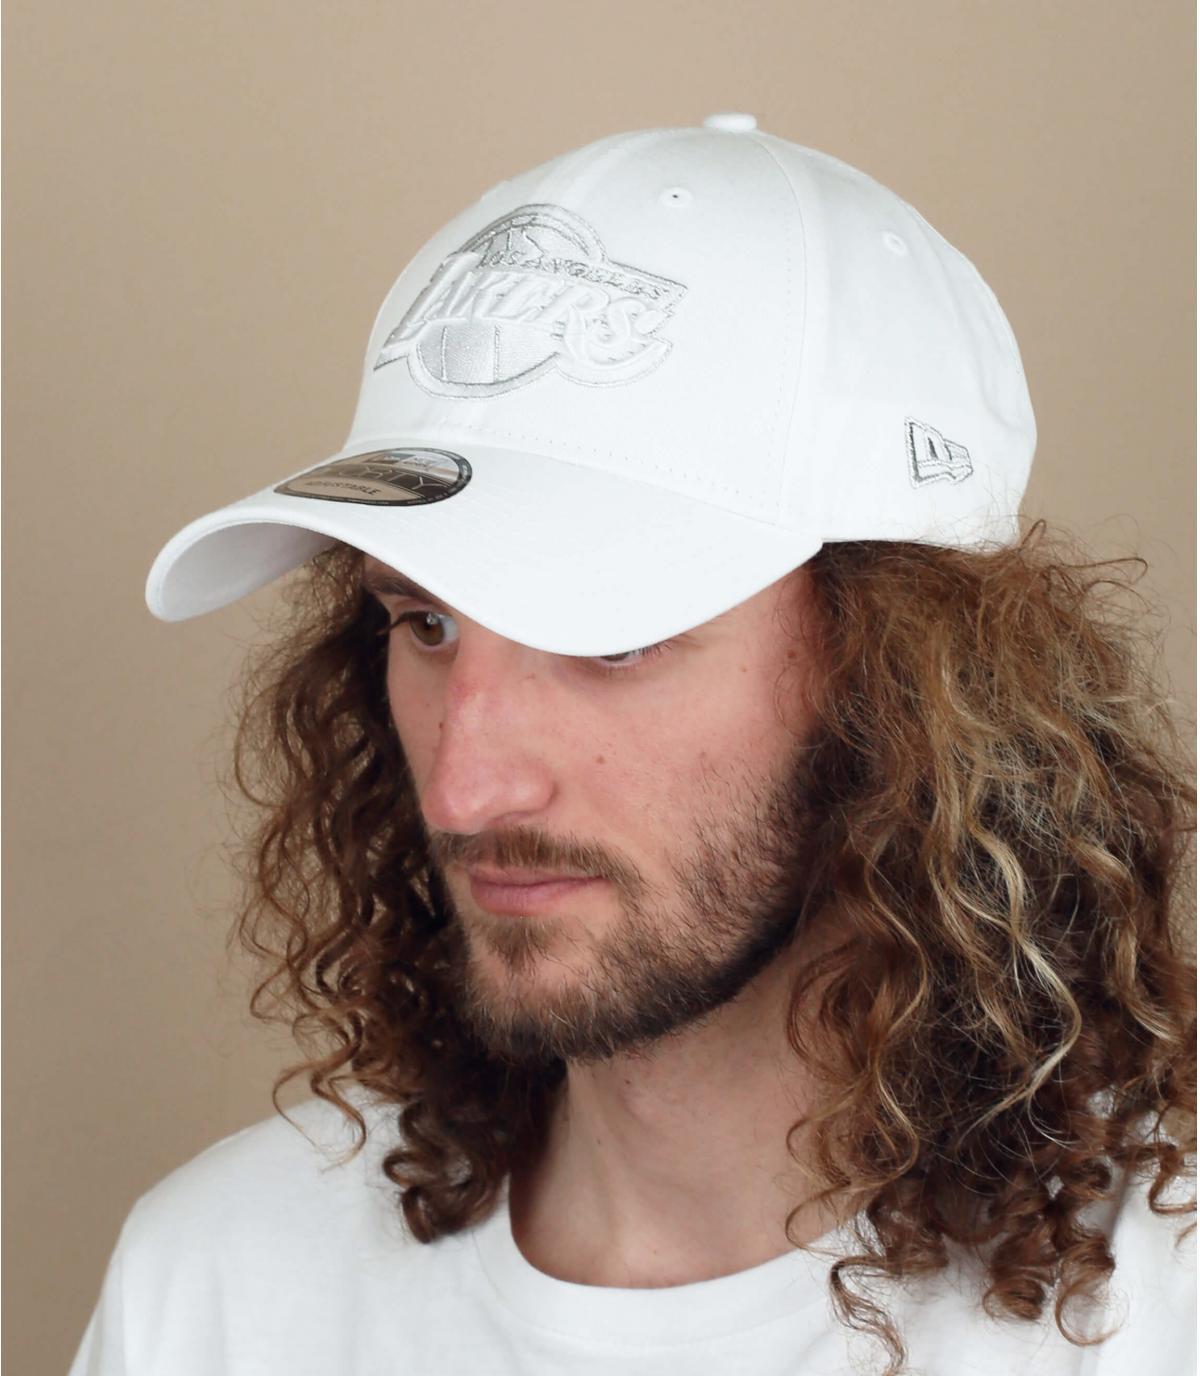 Cappellino dei Lakers bianco argento